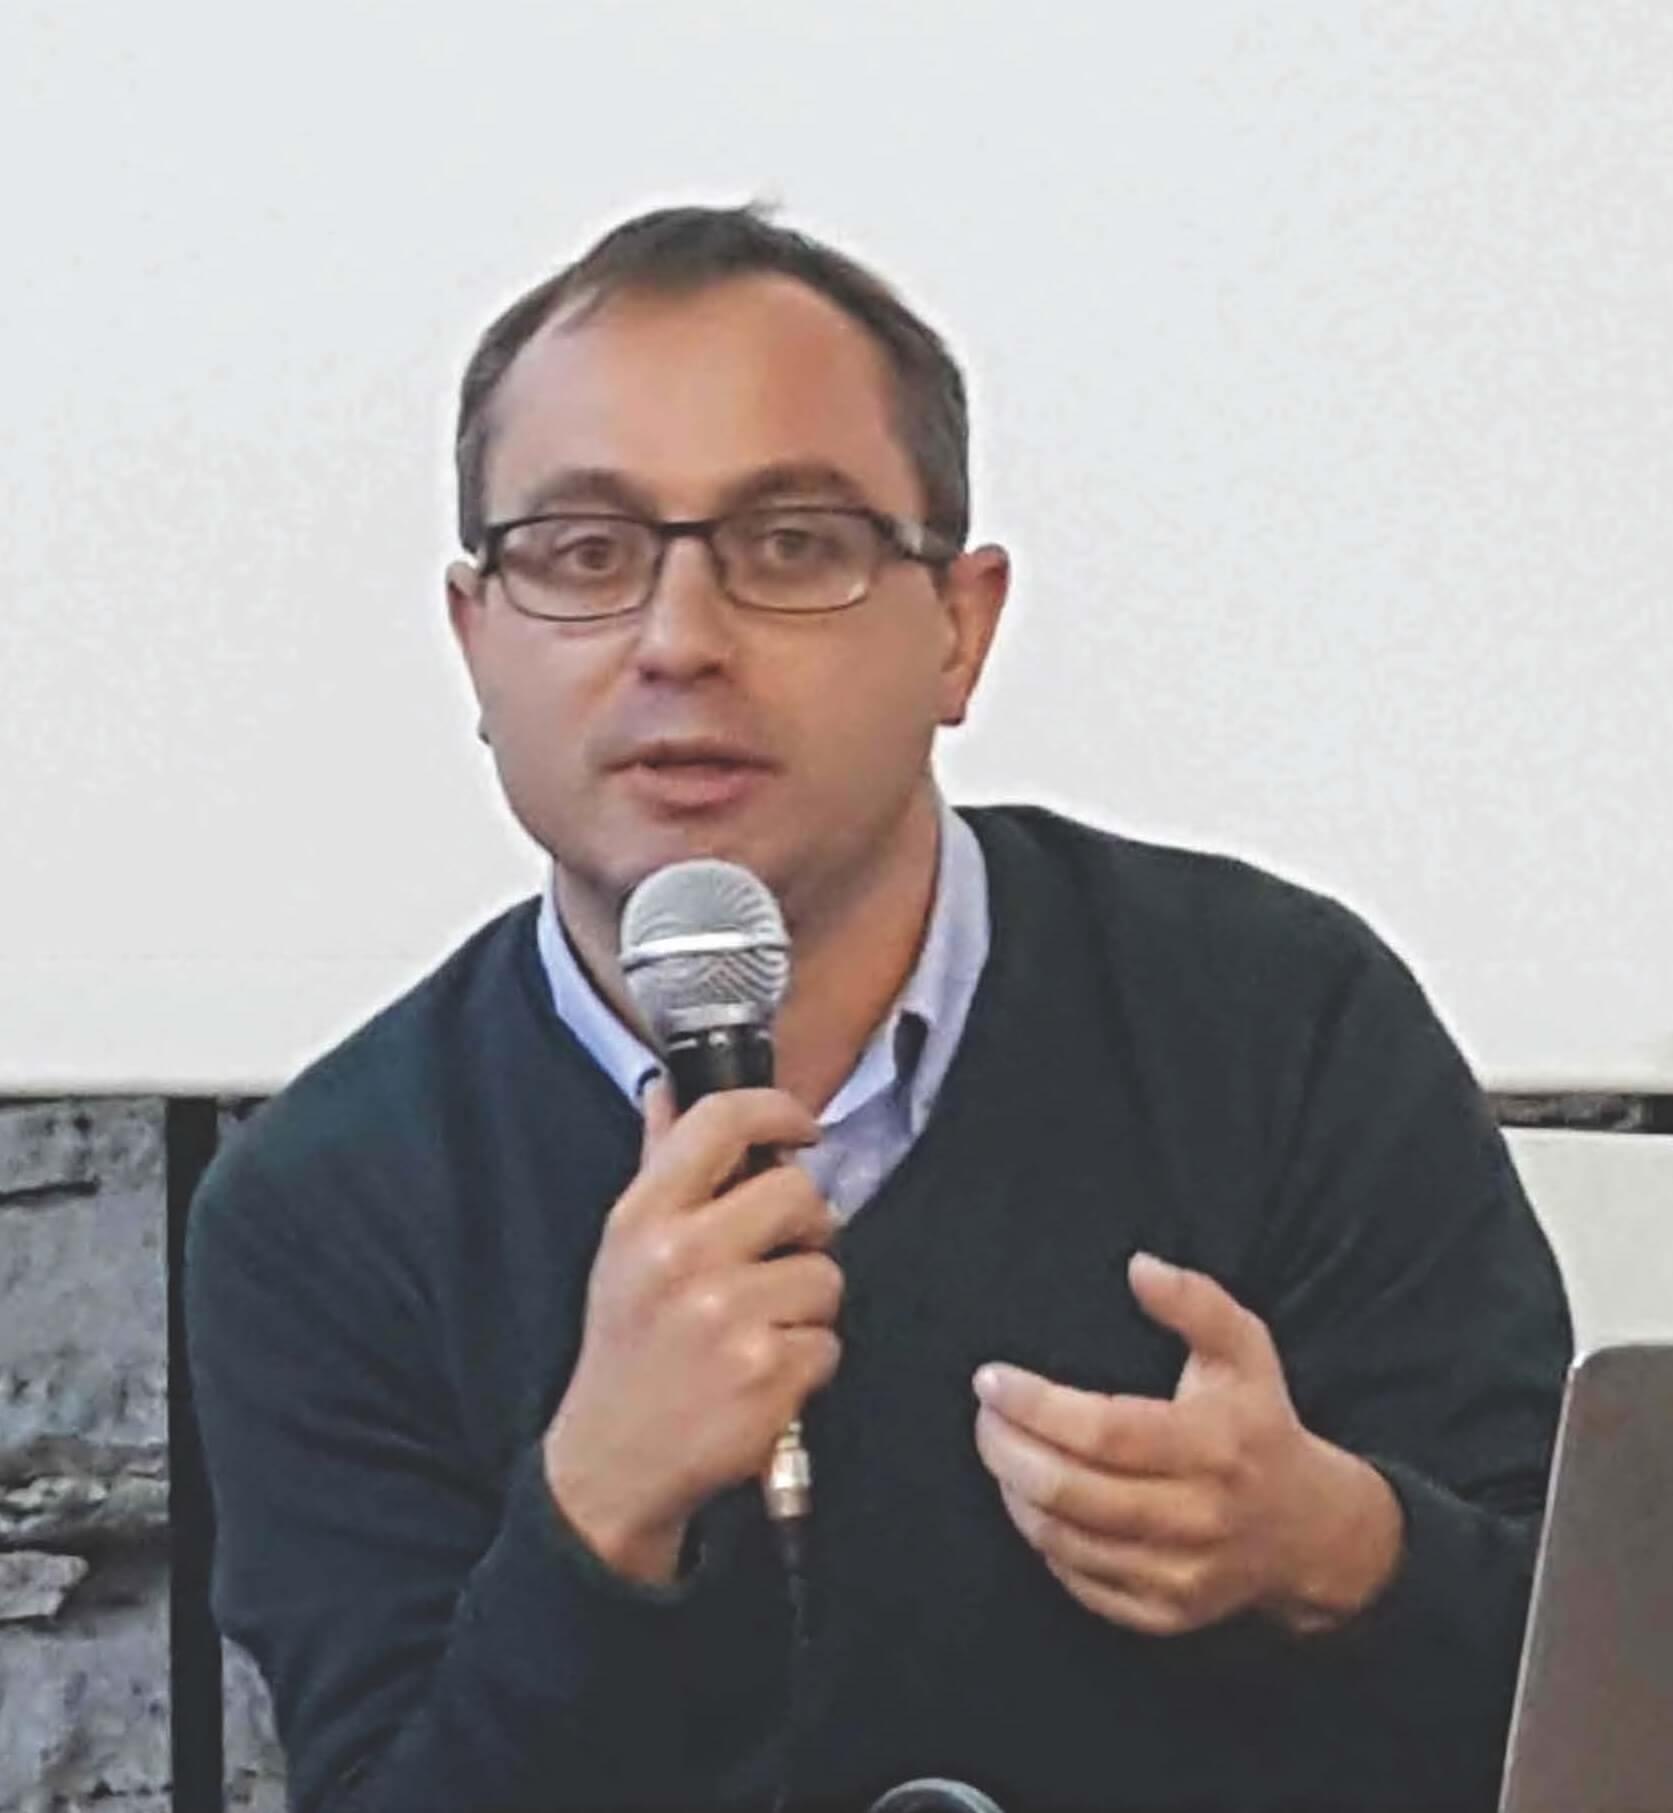 Massimiliano Marianelli